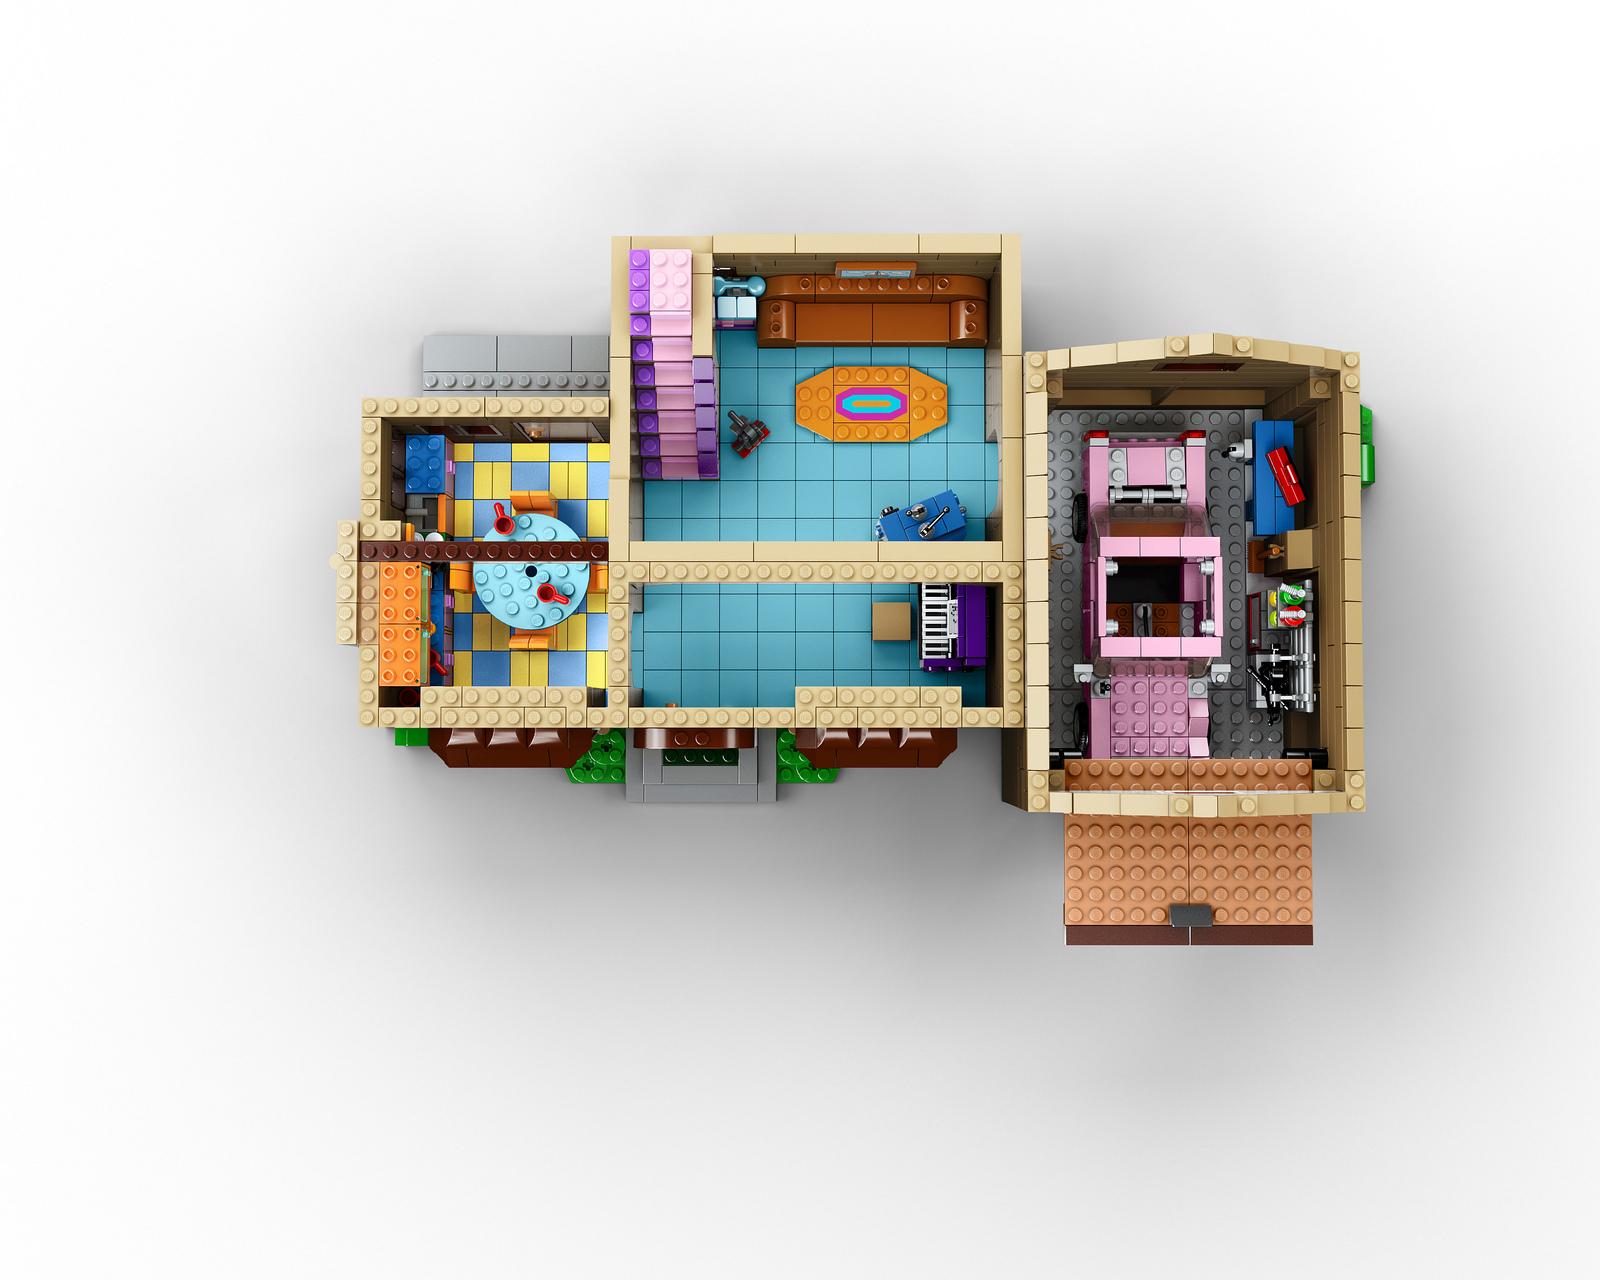 Maison-Lego-Simpsons-09